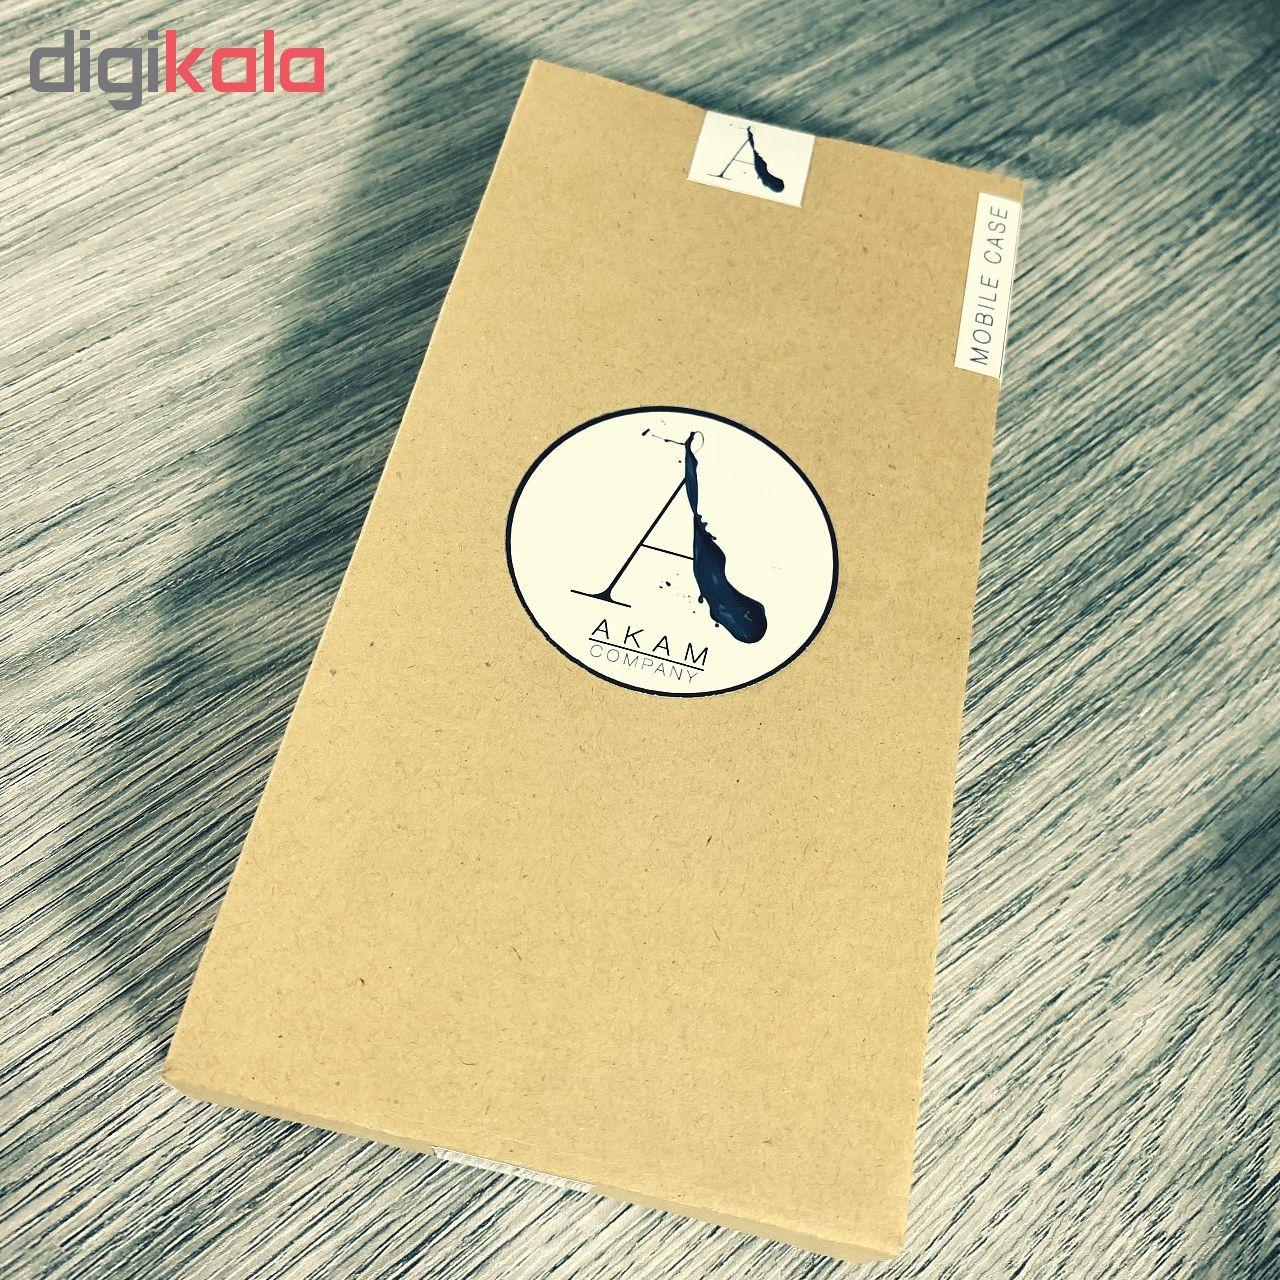 کاور آکام مدل A7P1550 مناسب برای گوشی موبایل اپل iPhone 7 Plus/8 plus main 1 2